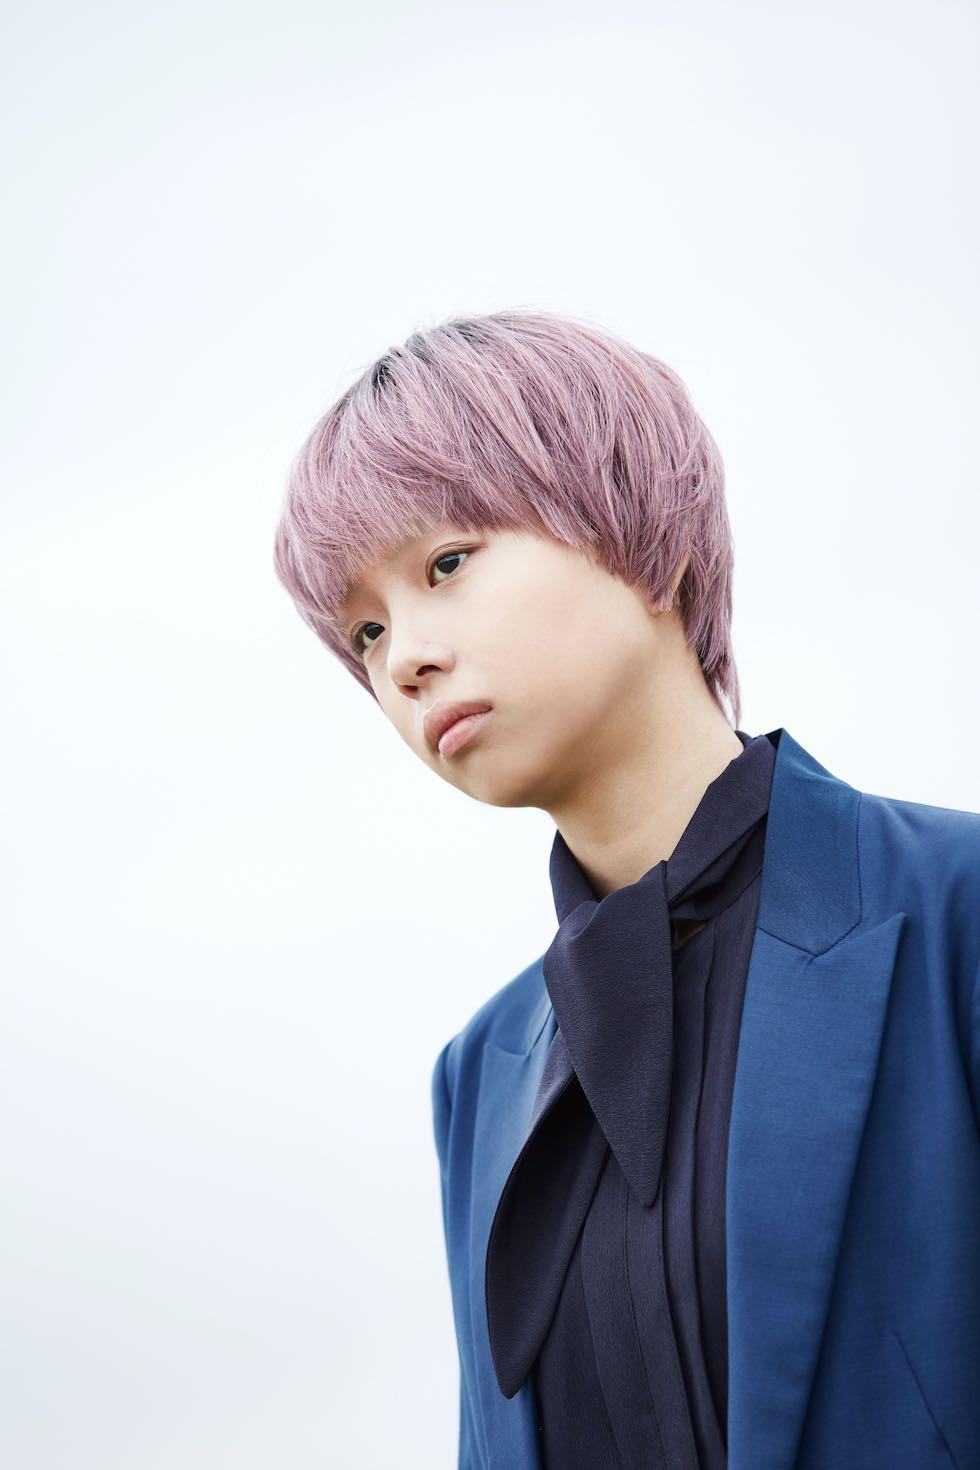 Maica_n、20歳の決意!1stアルバム「replica」詳細情報解禁!